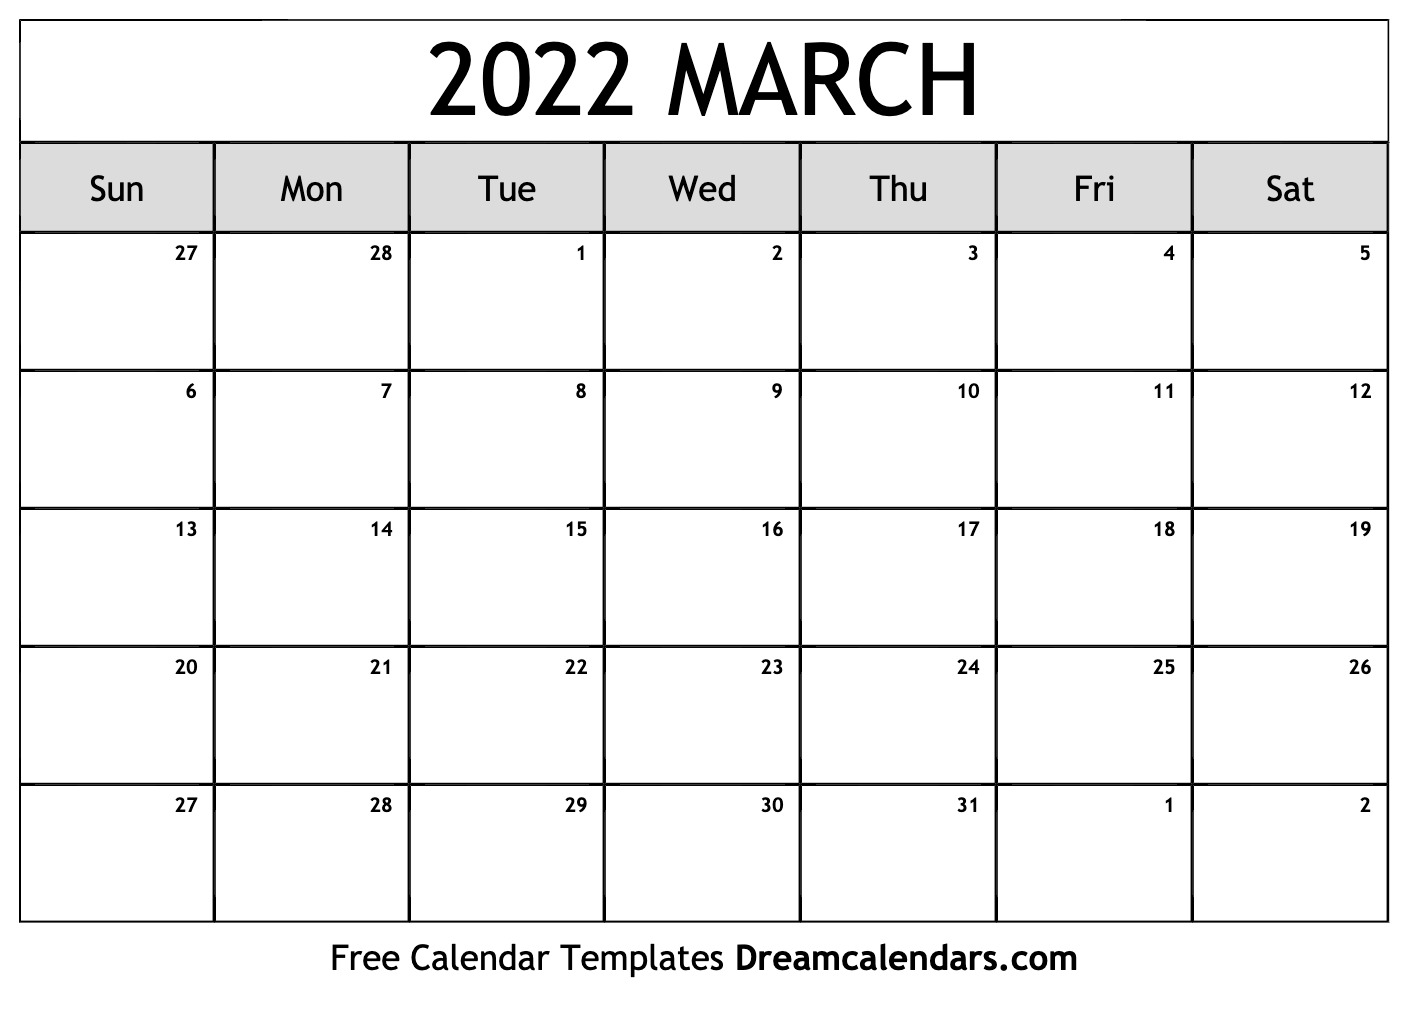 March Blank Calendar 2022.March 2022 Calendar Free Blank Printable Templates